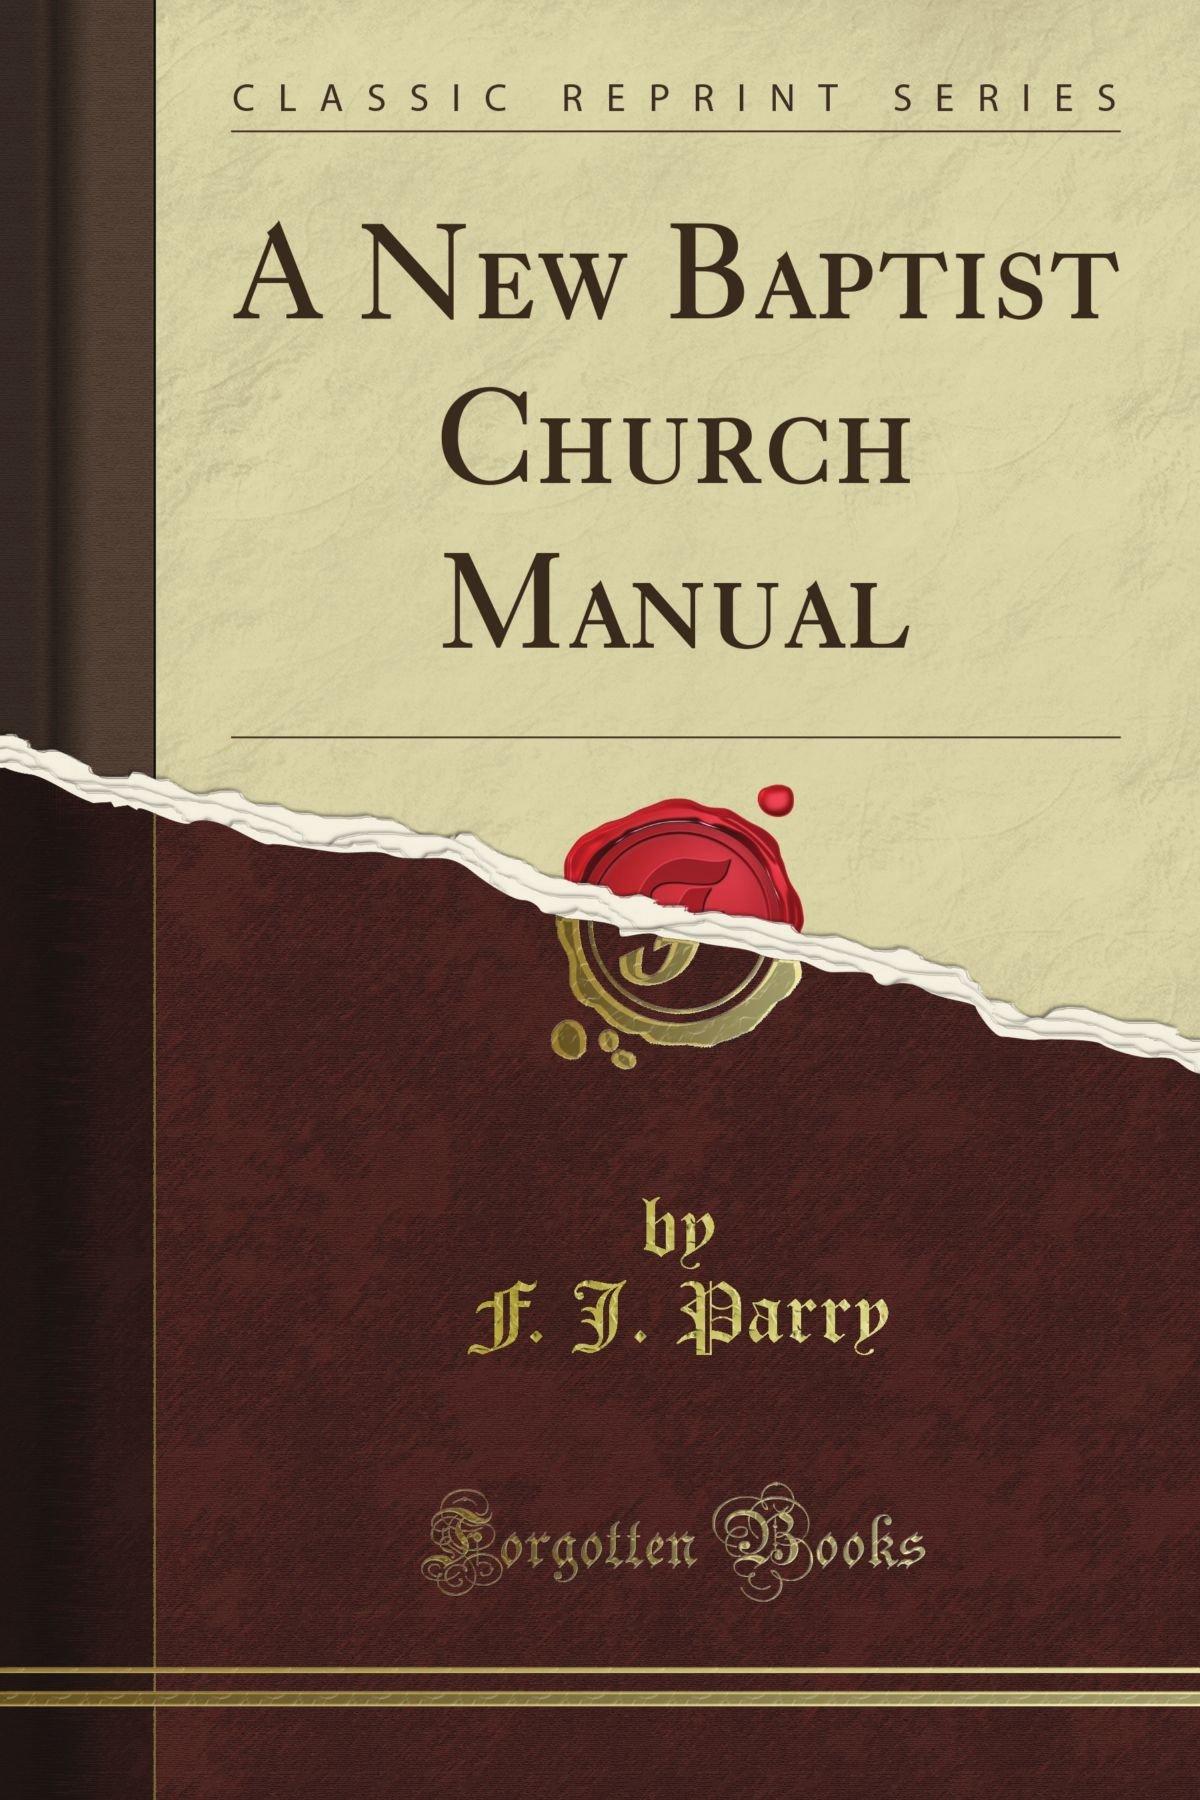 A New Baptist Church Manual (Classic Reprint) ebook